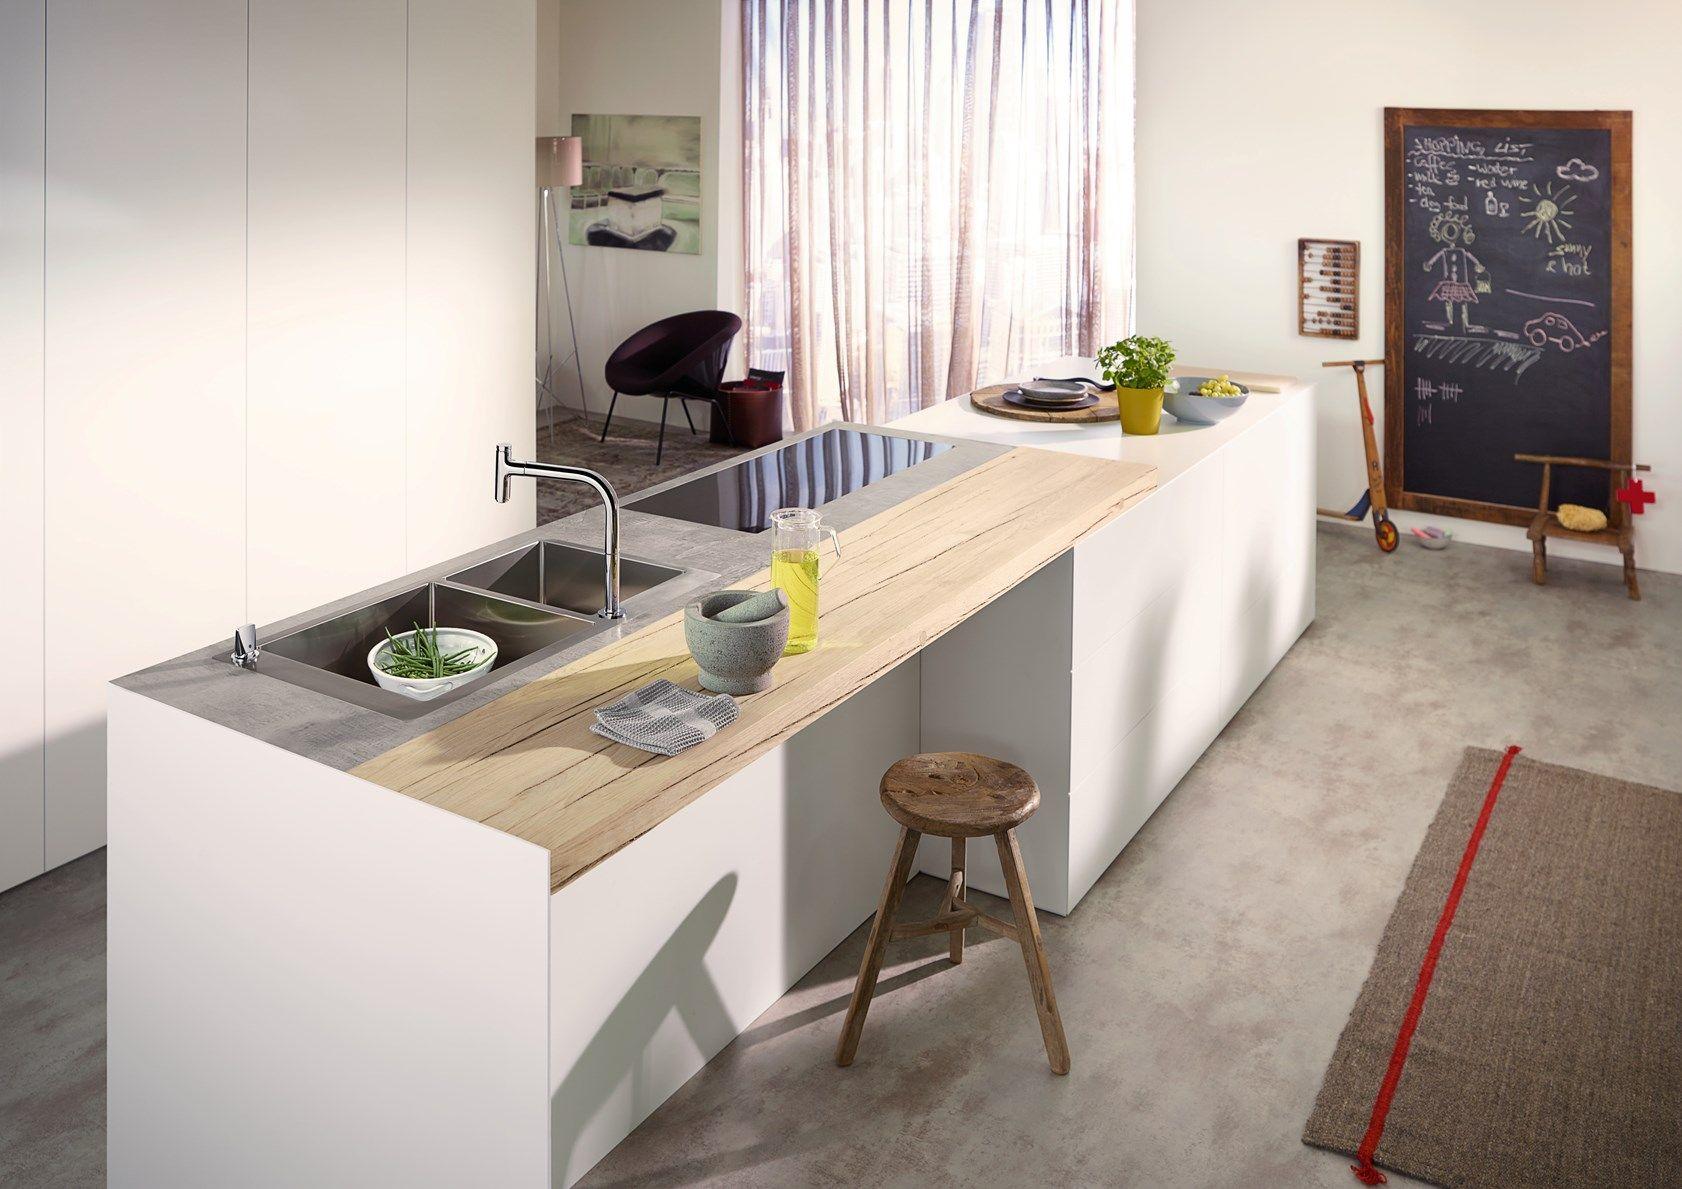 Hansgrohe Nuovi Standard In Cucina